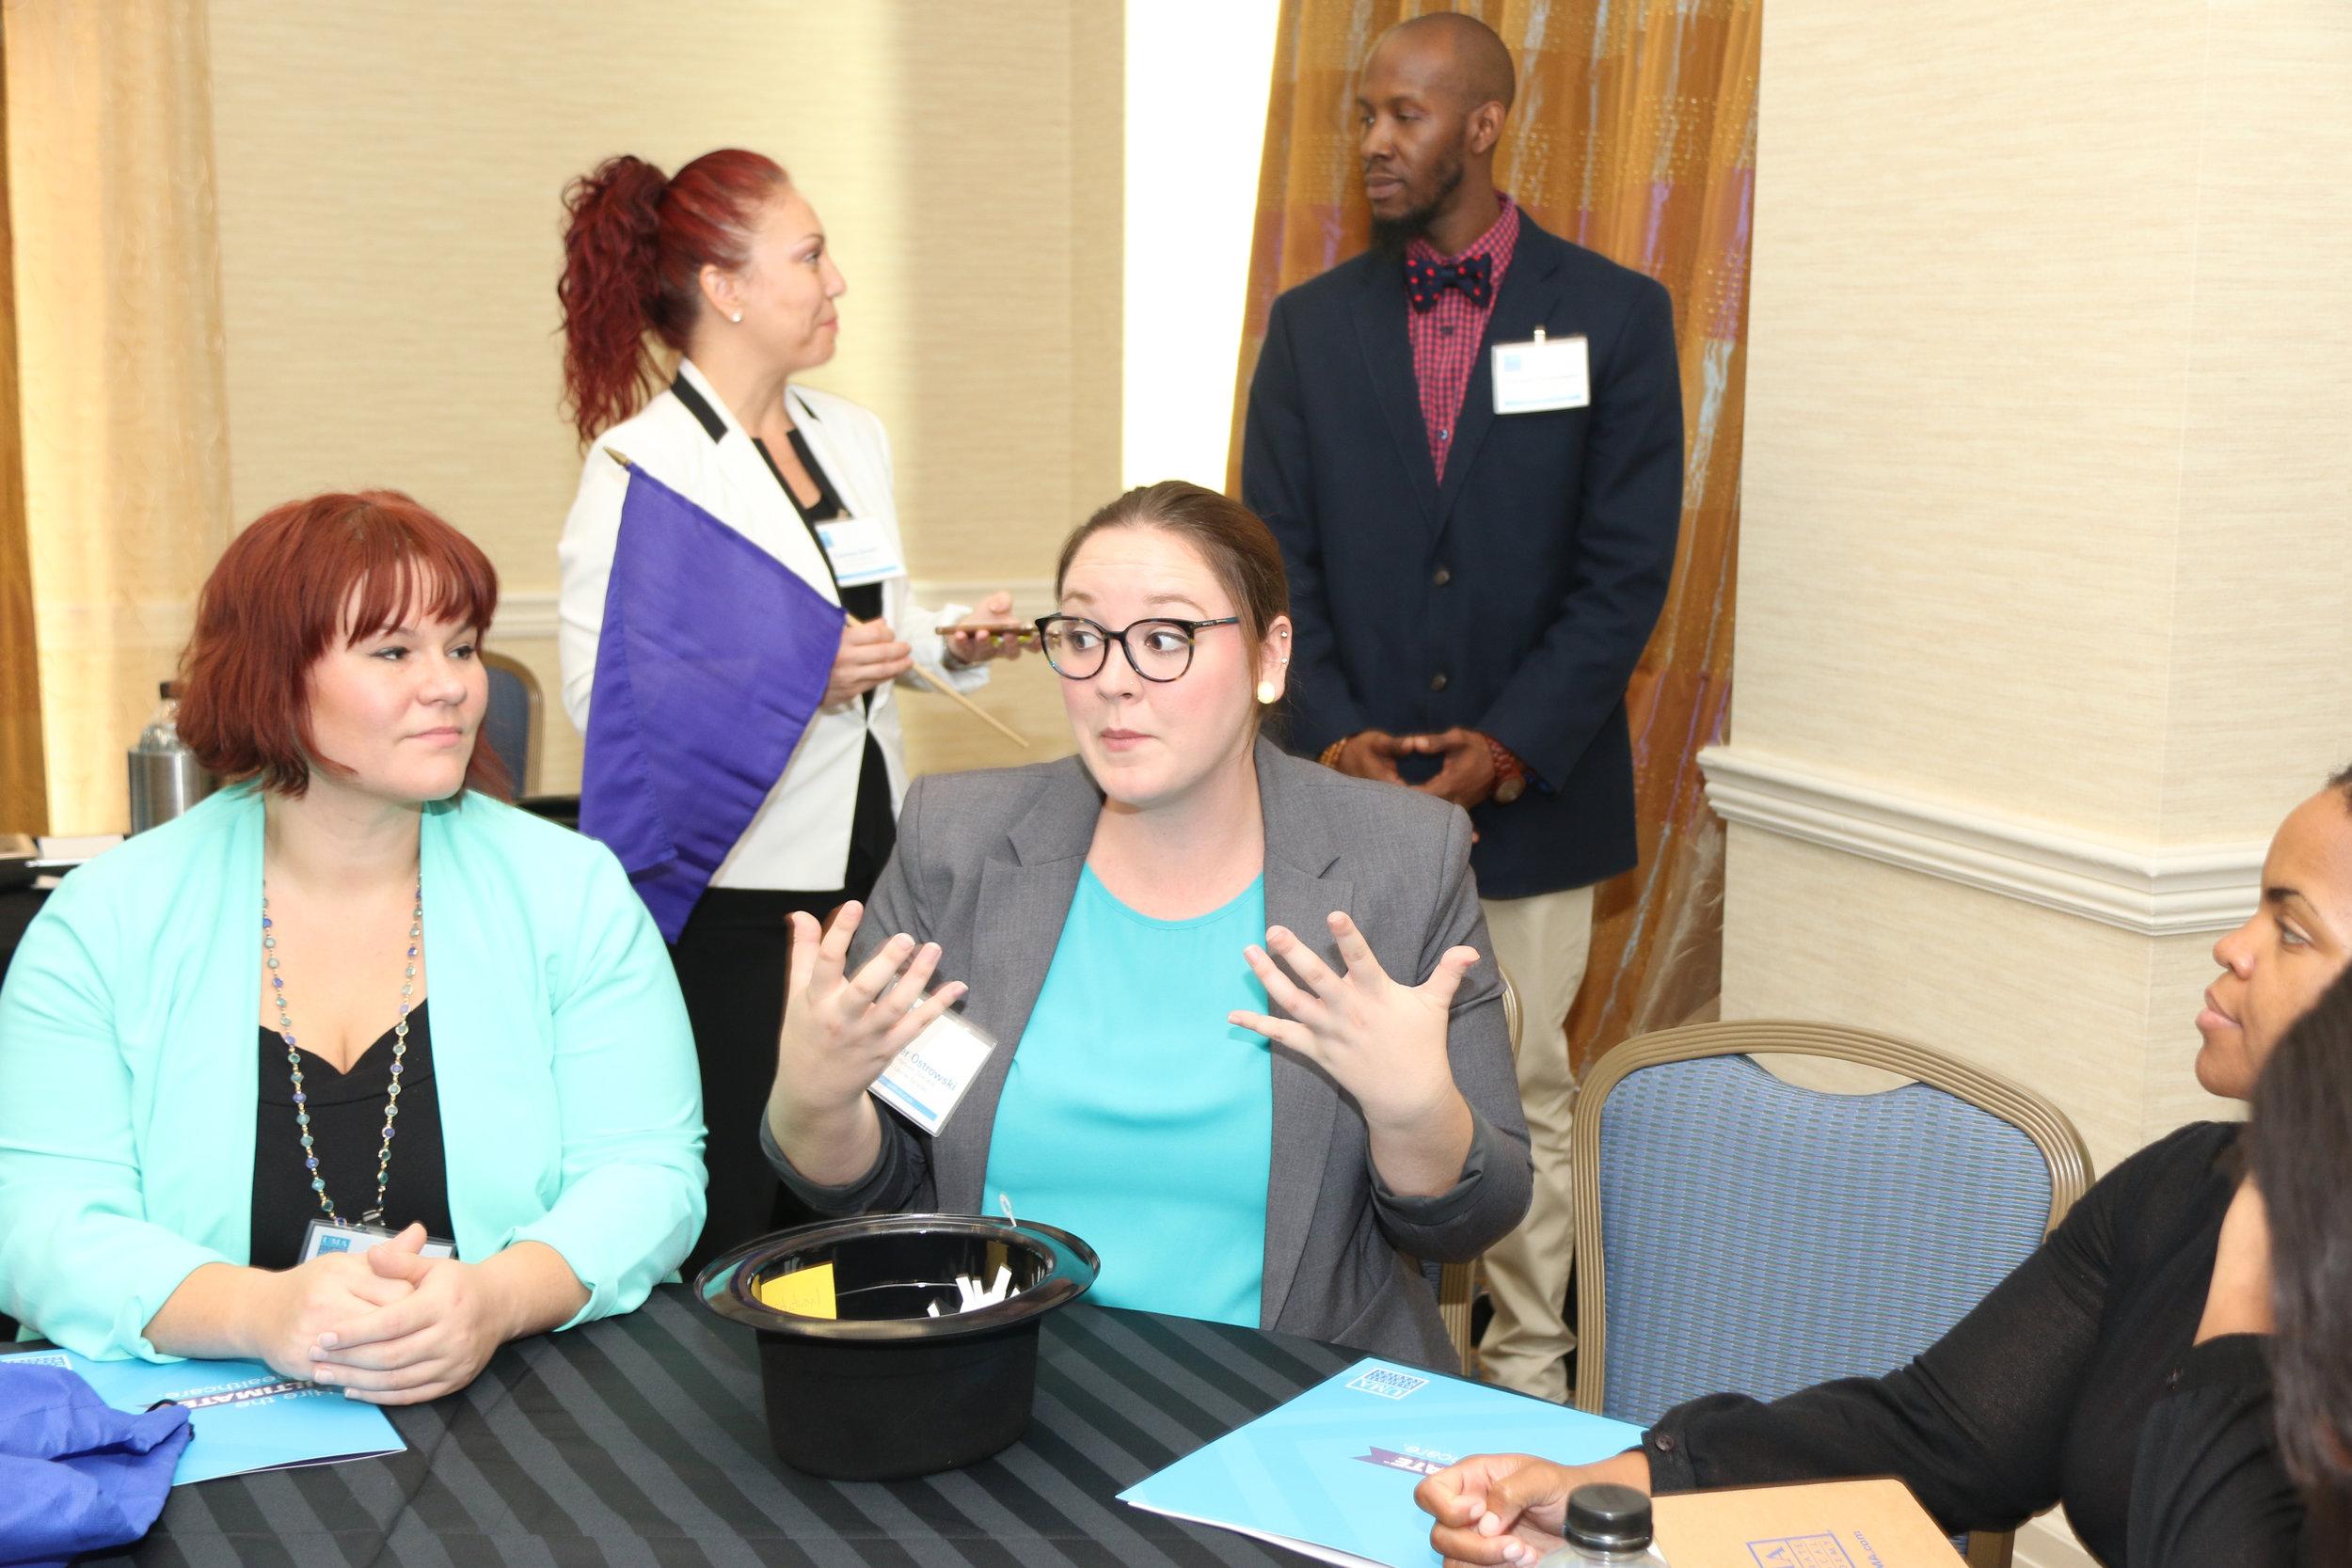 277_WomensConference_10-26-17.jpg